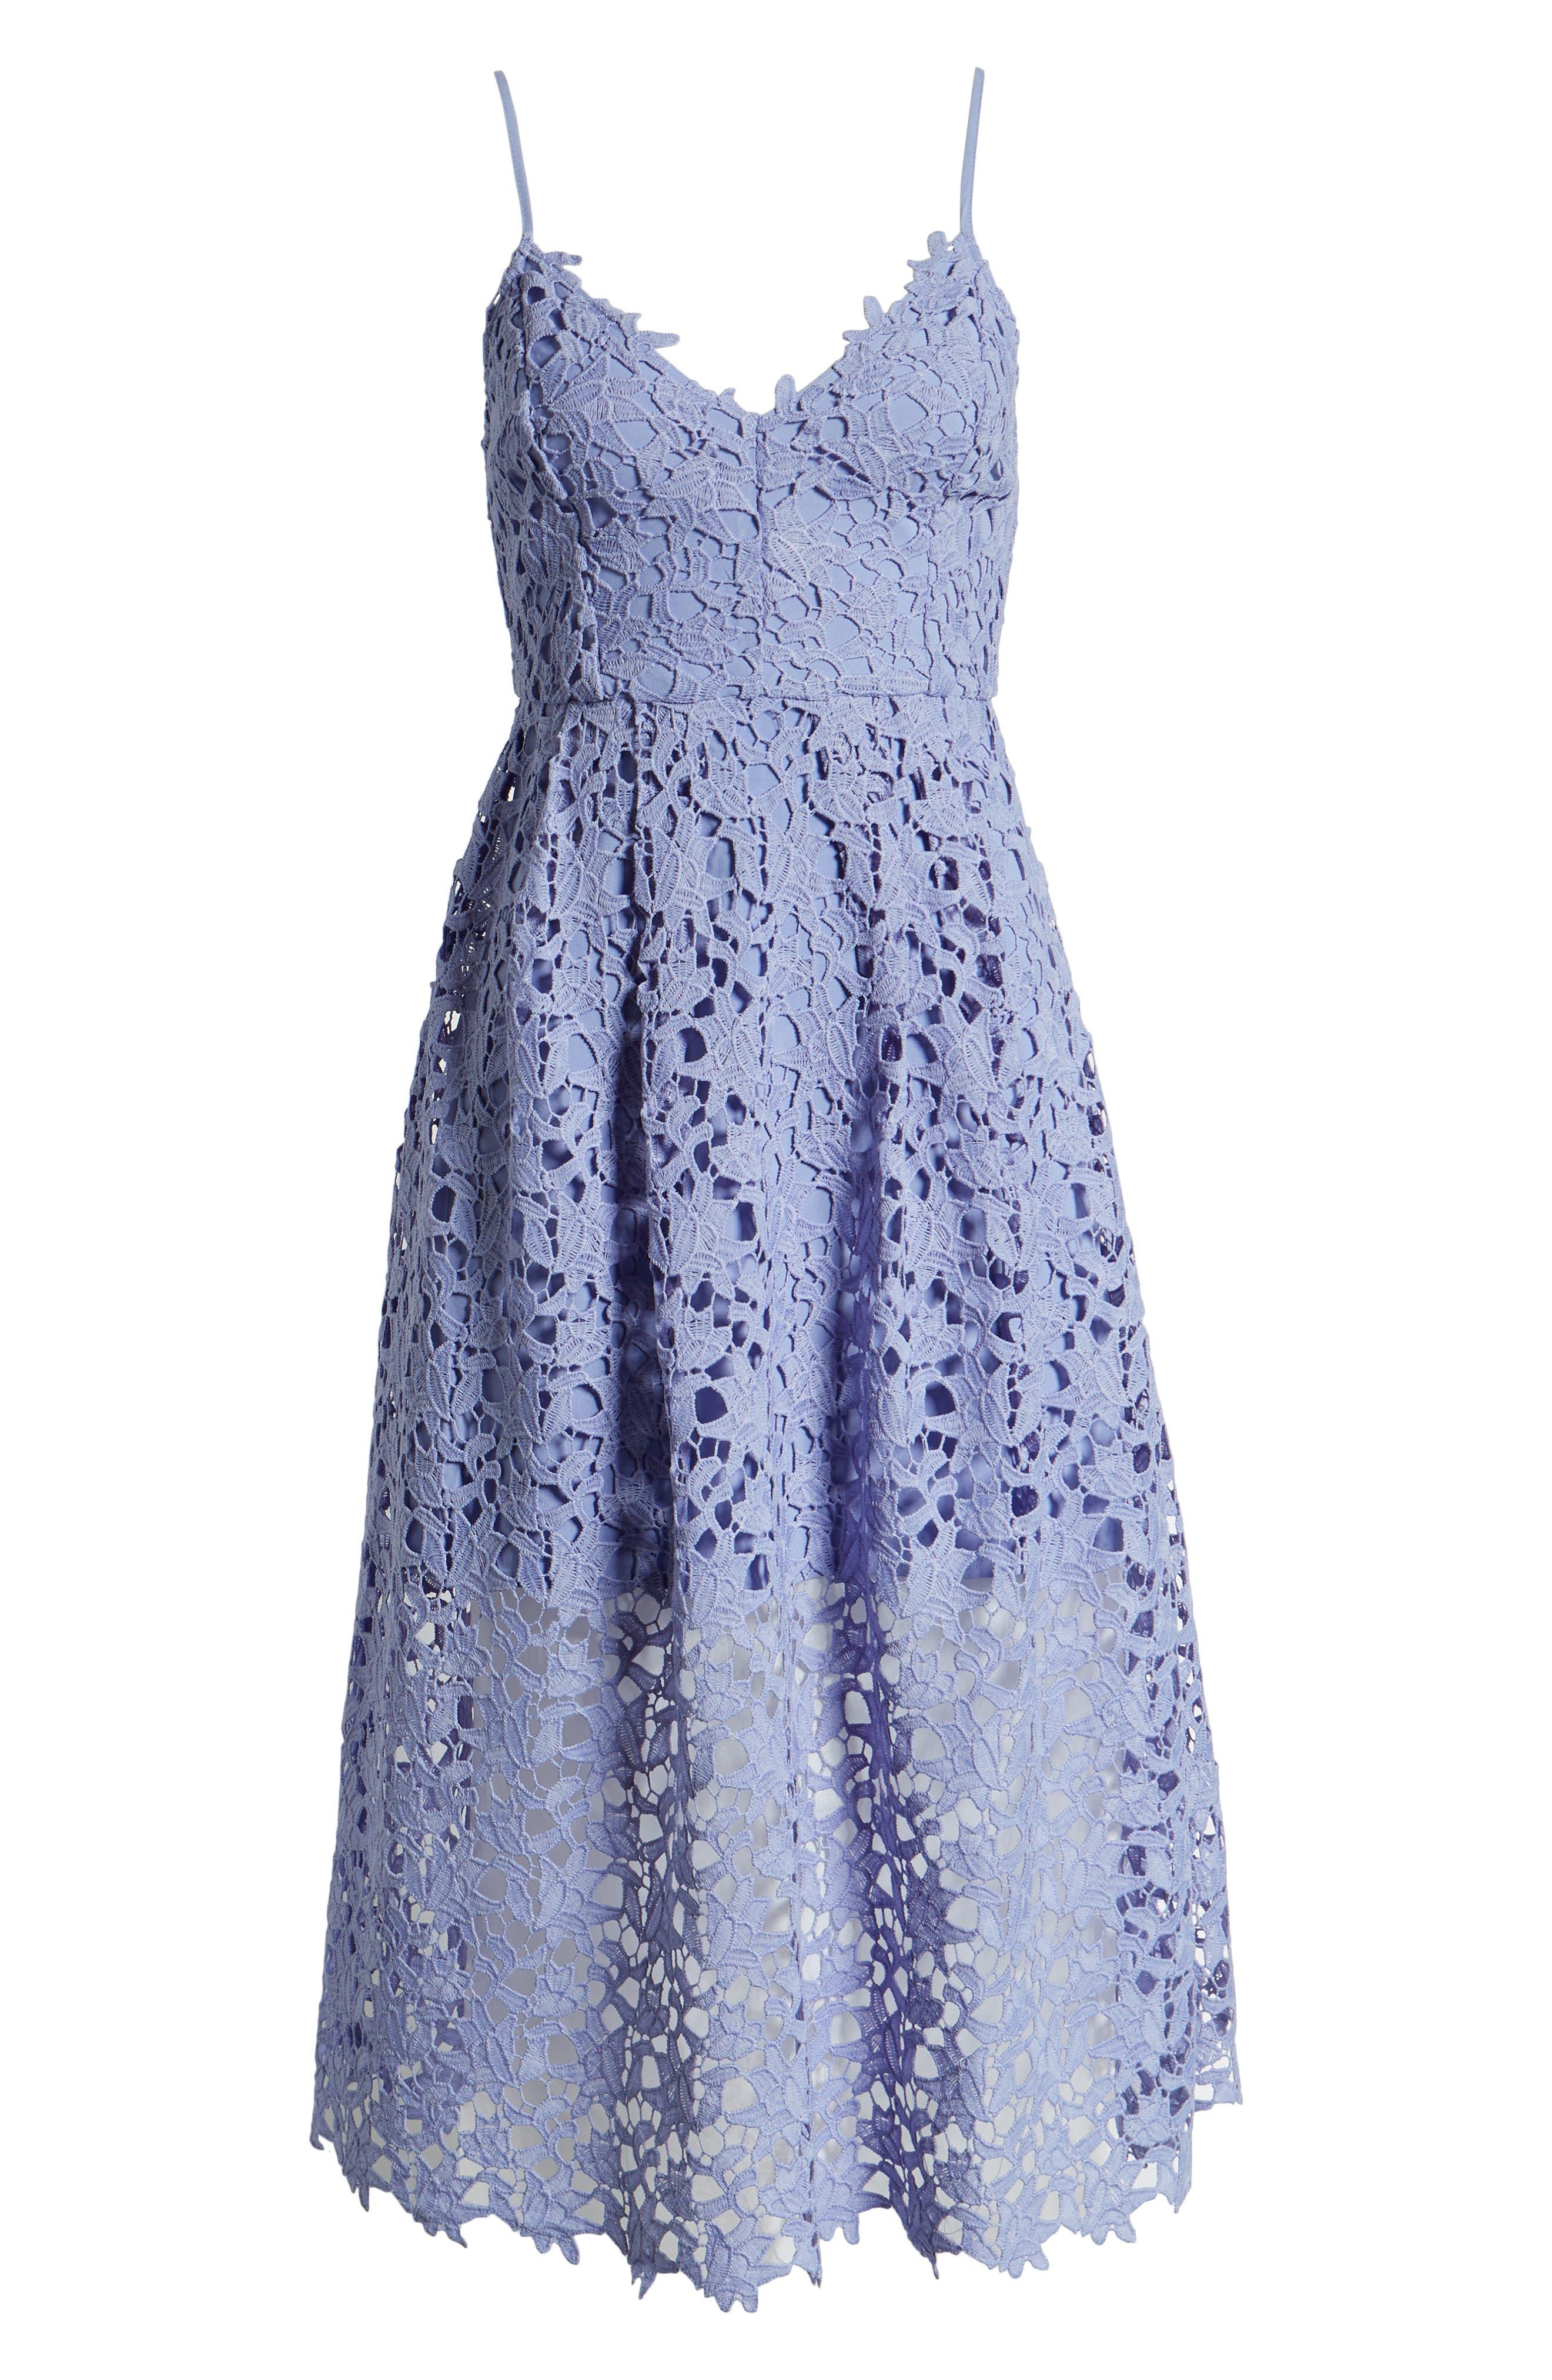 ASTR THE LABEL,                             Lace Midi Dress,                             Alternate thumbnail 7, color,                             LAVENDER